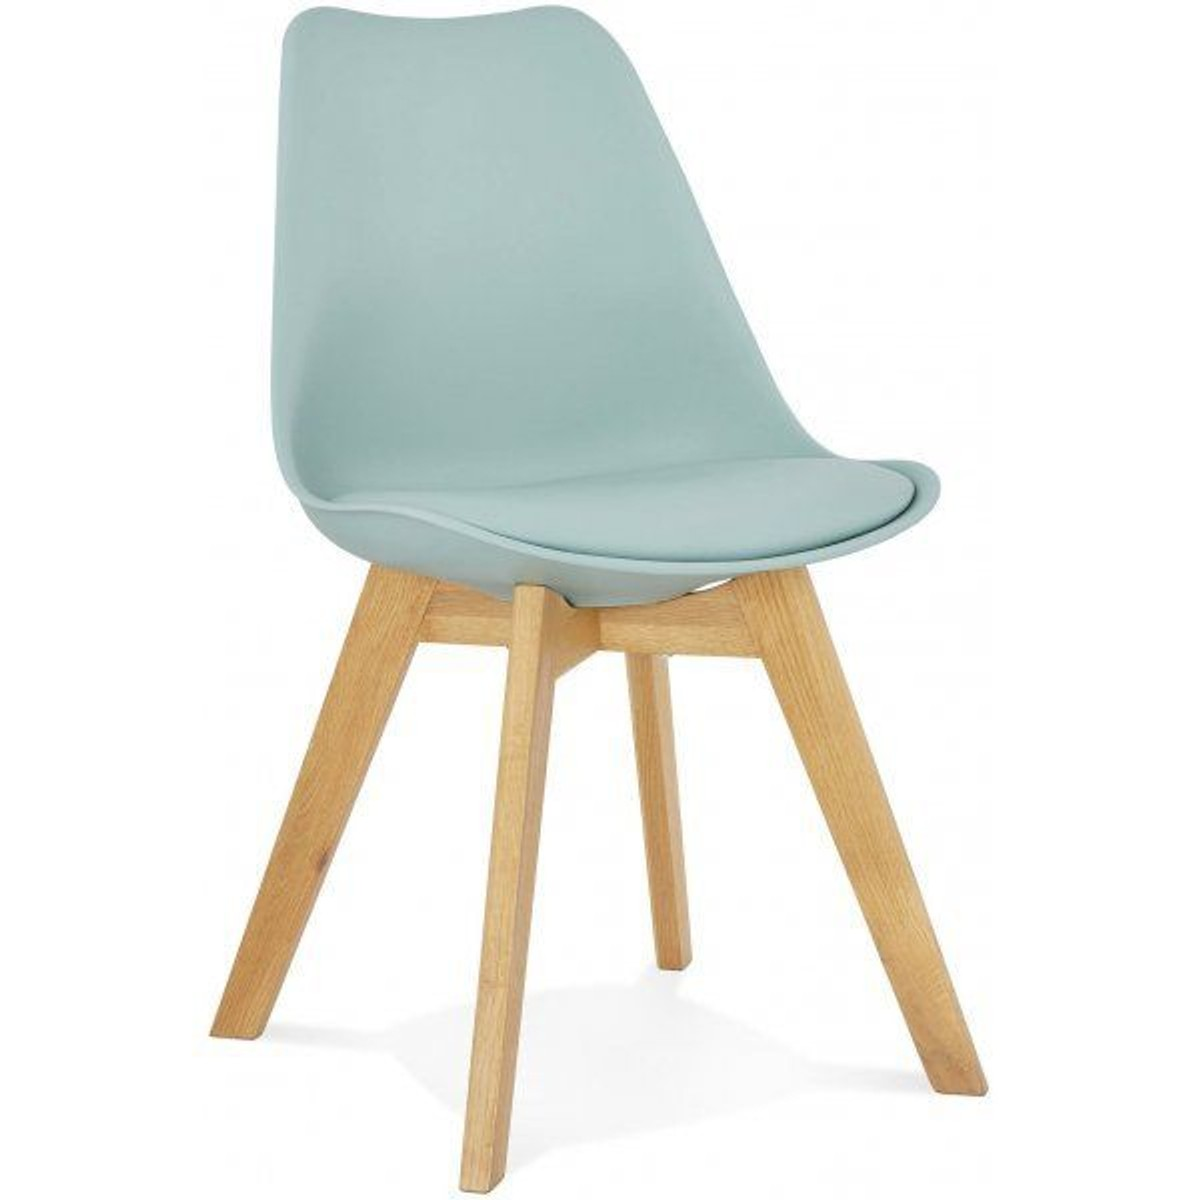 Design TailleUniqueProducts Tylik Design Chaise Tylik Design Chaise TailleUniqueProducts Chaise xoeBdC